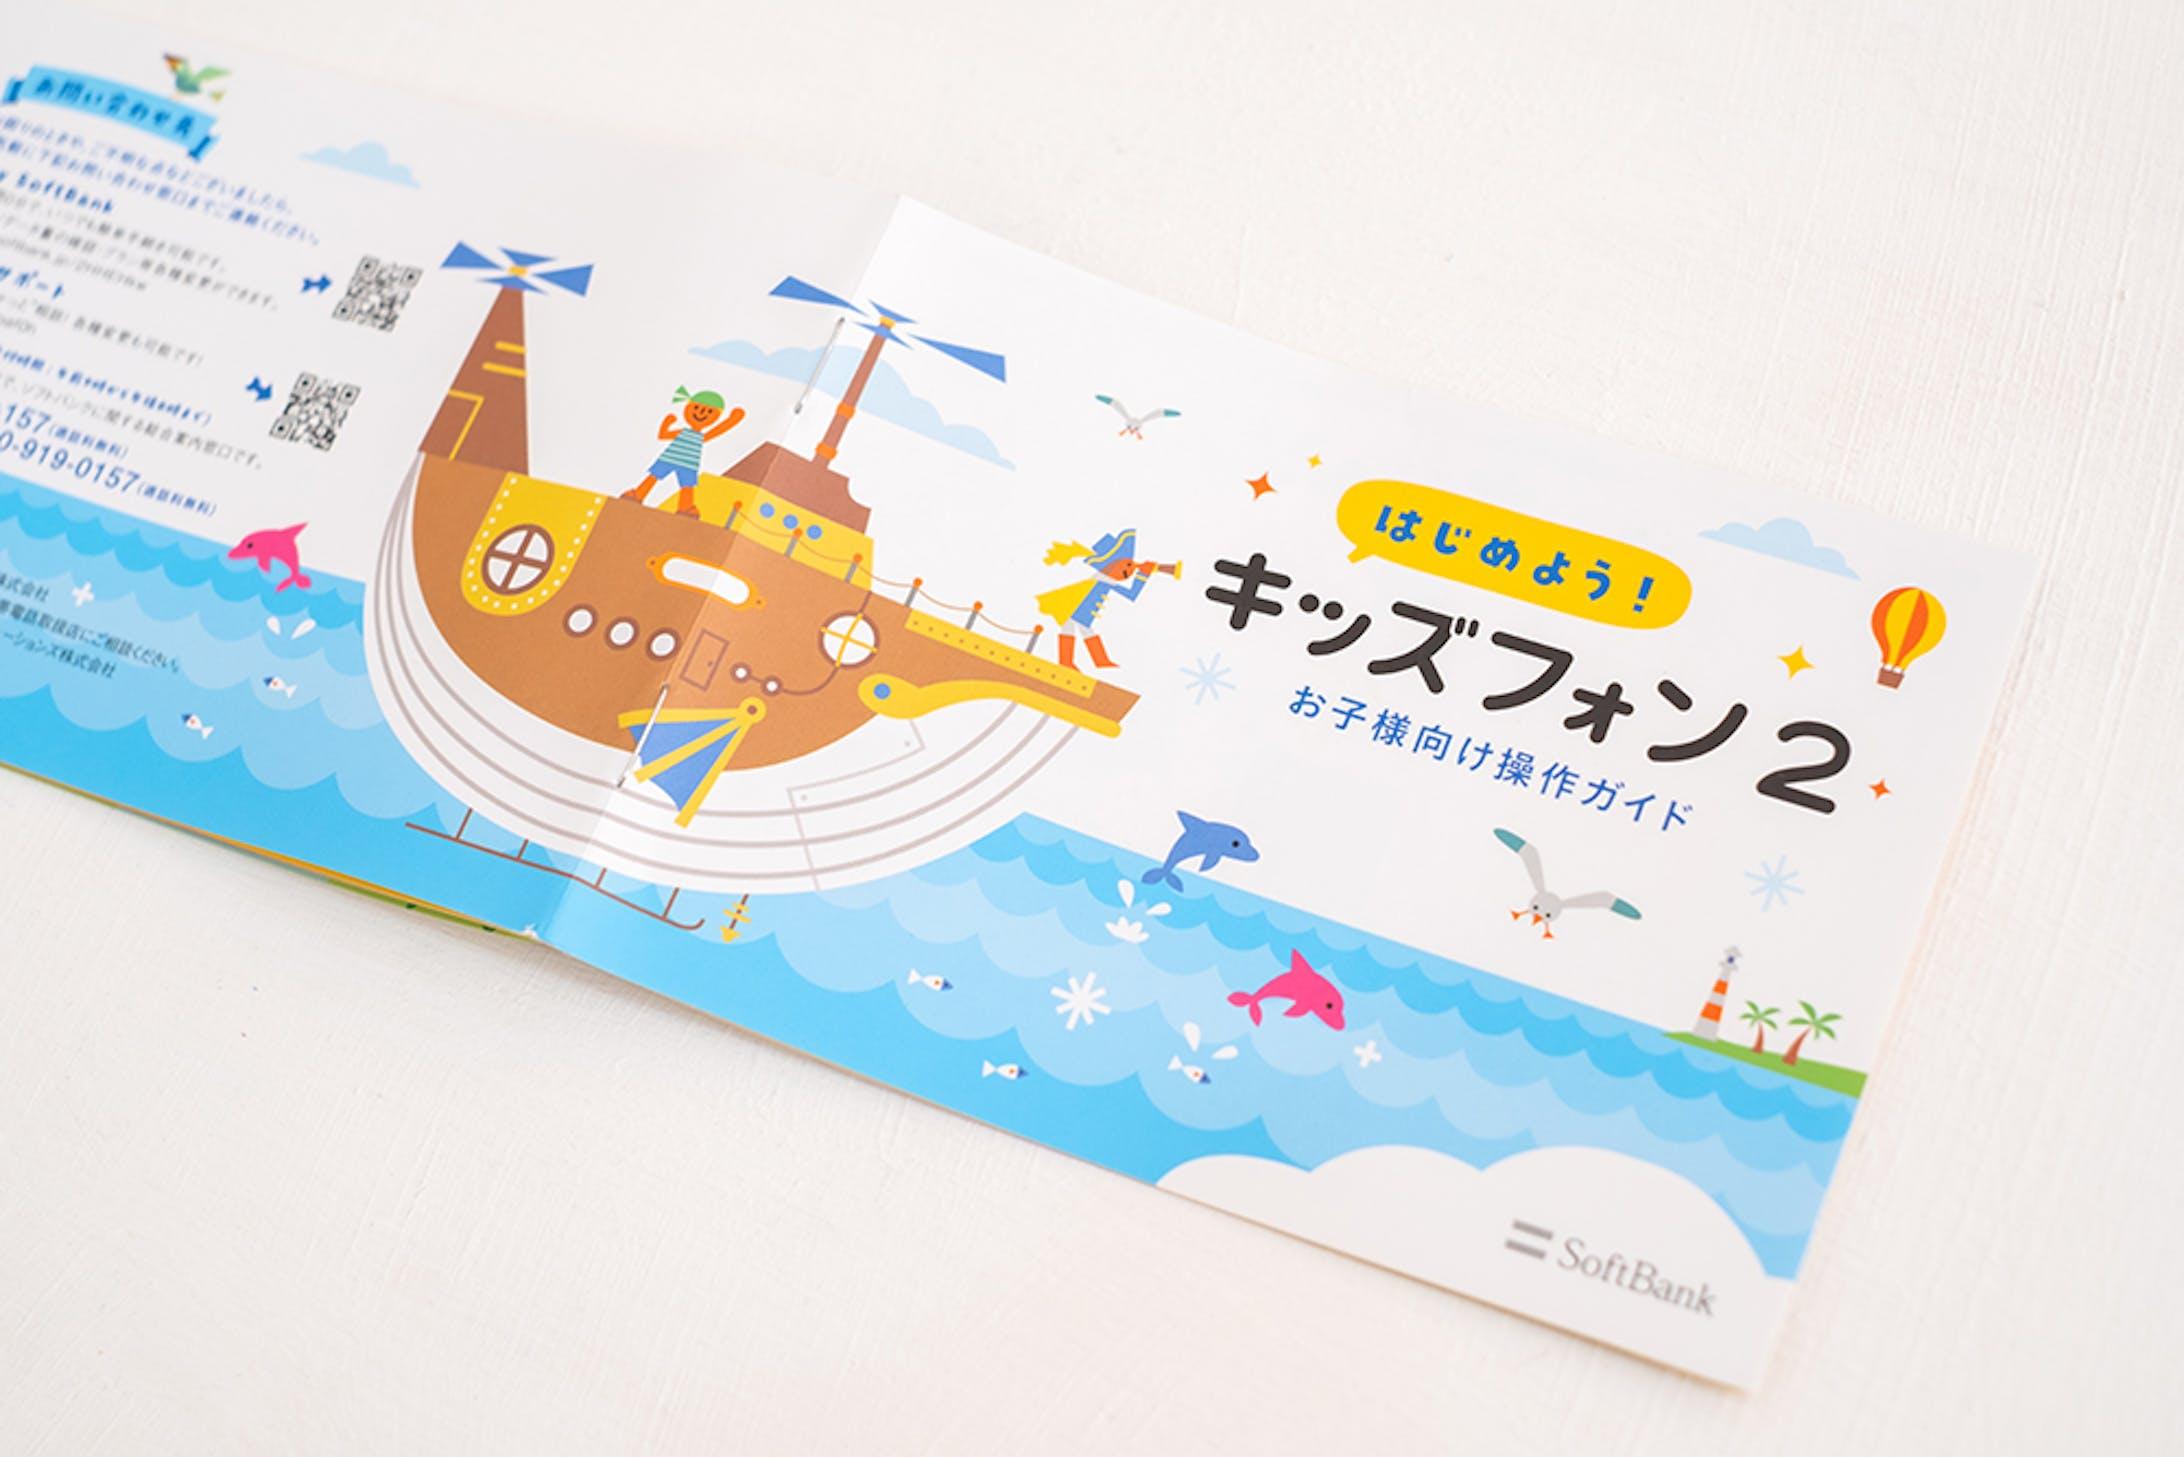 SoftBank キッズフォン2-6